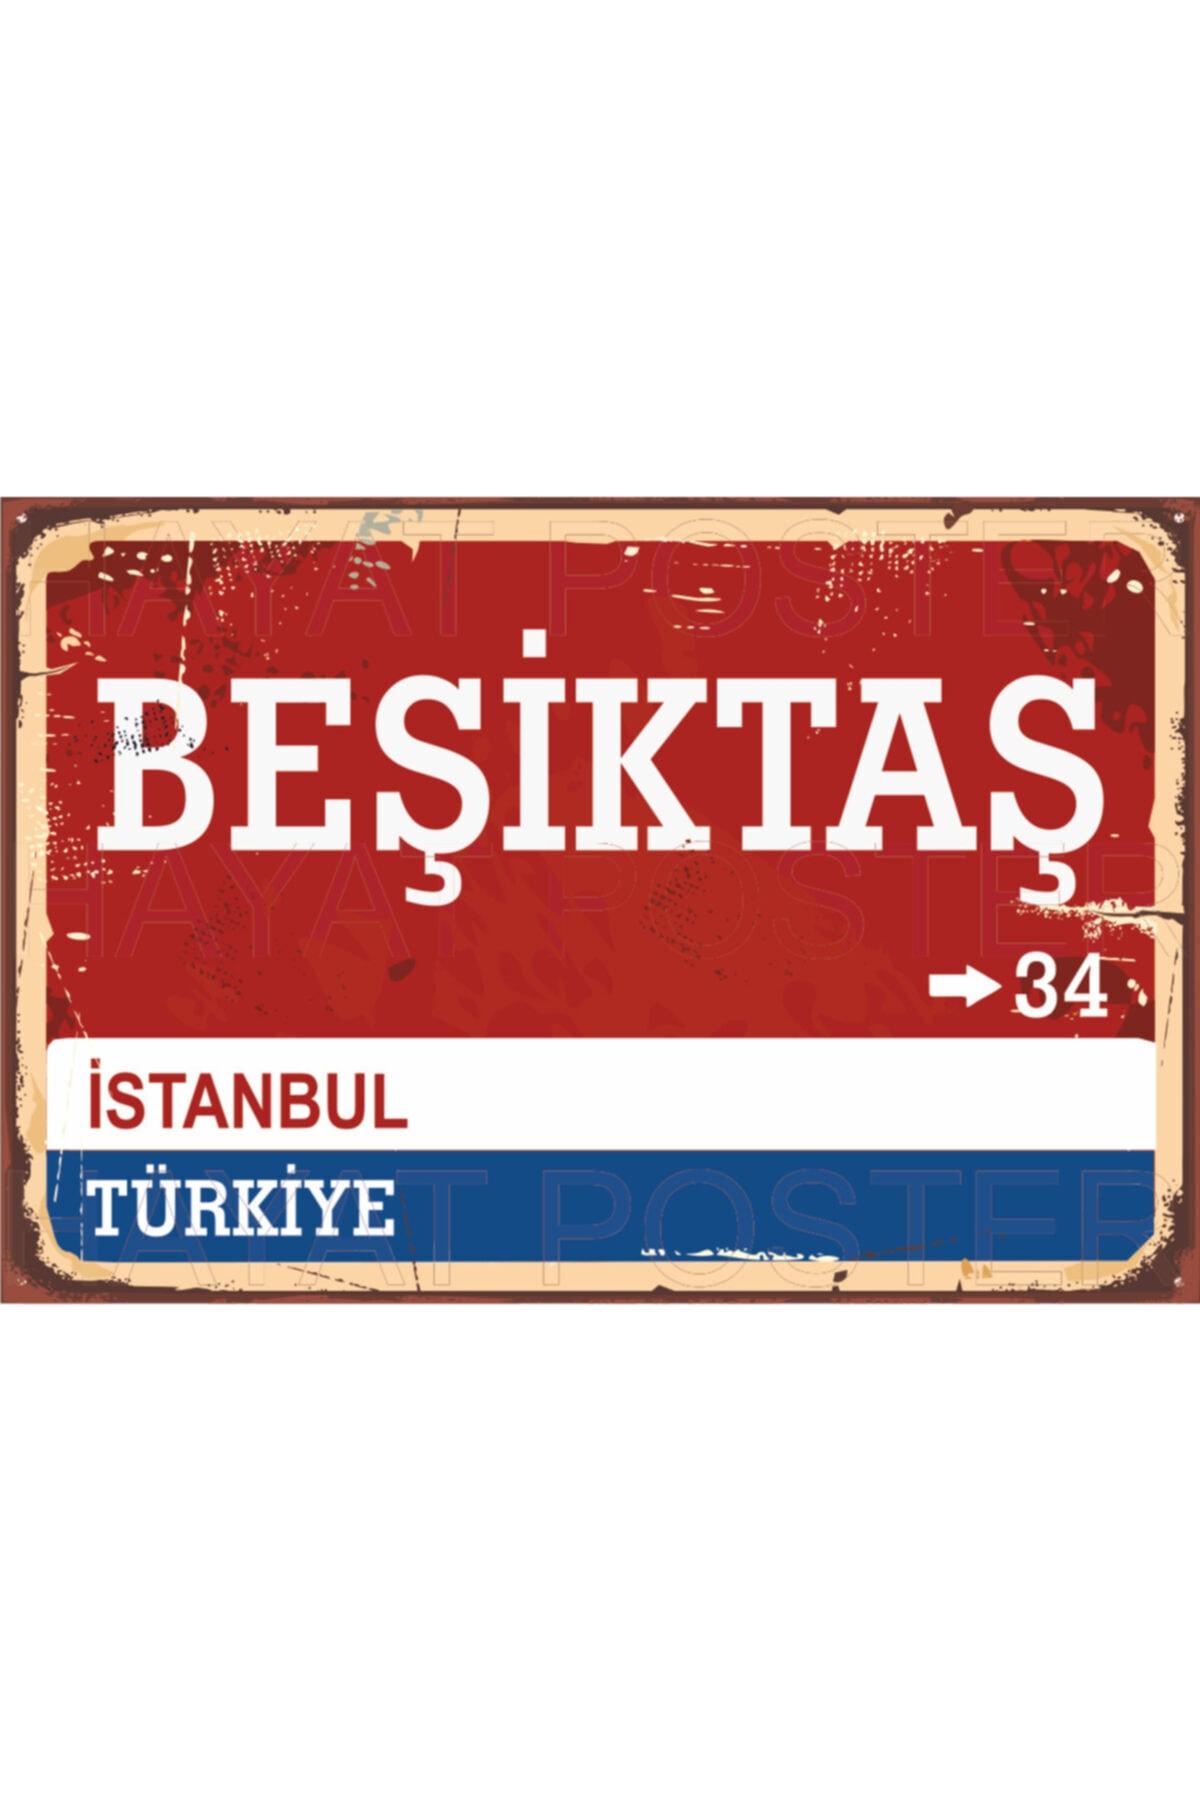 Beşiktaş Yön Sokak Tabelası Retro Vintage Ahşap Poster